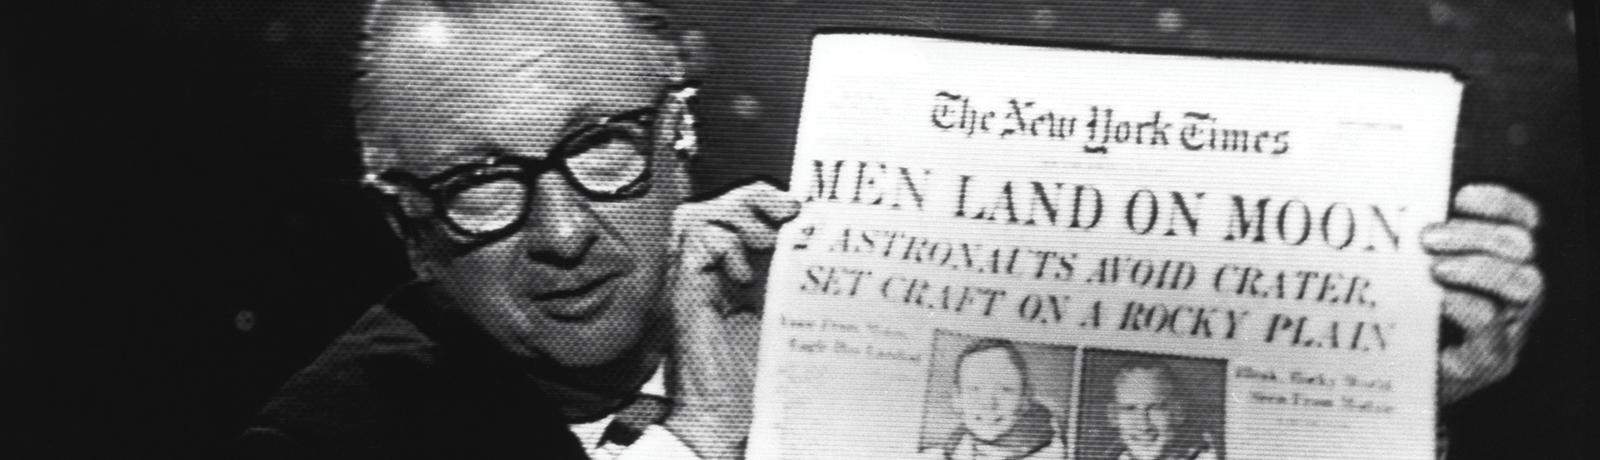 News Media History